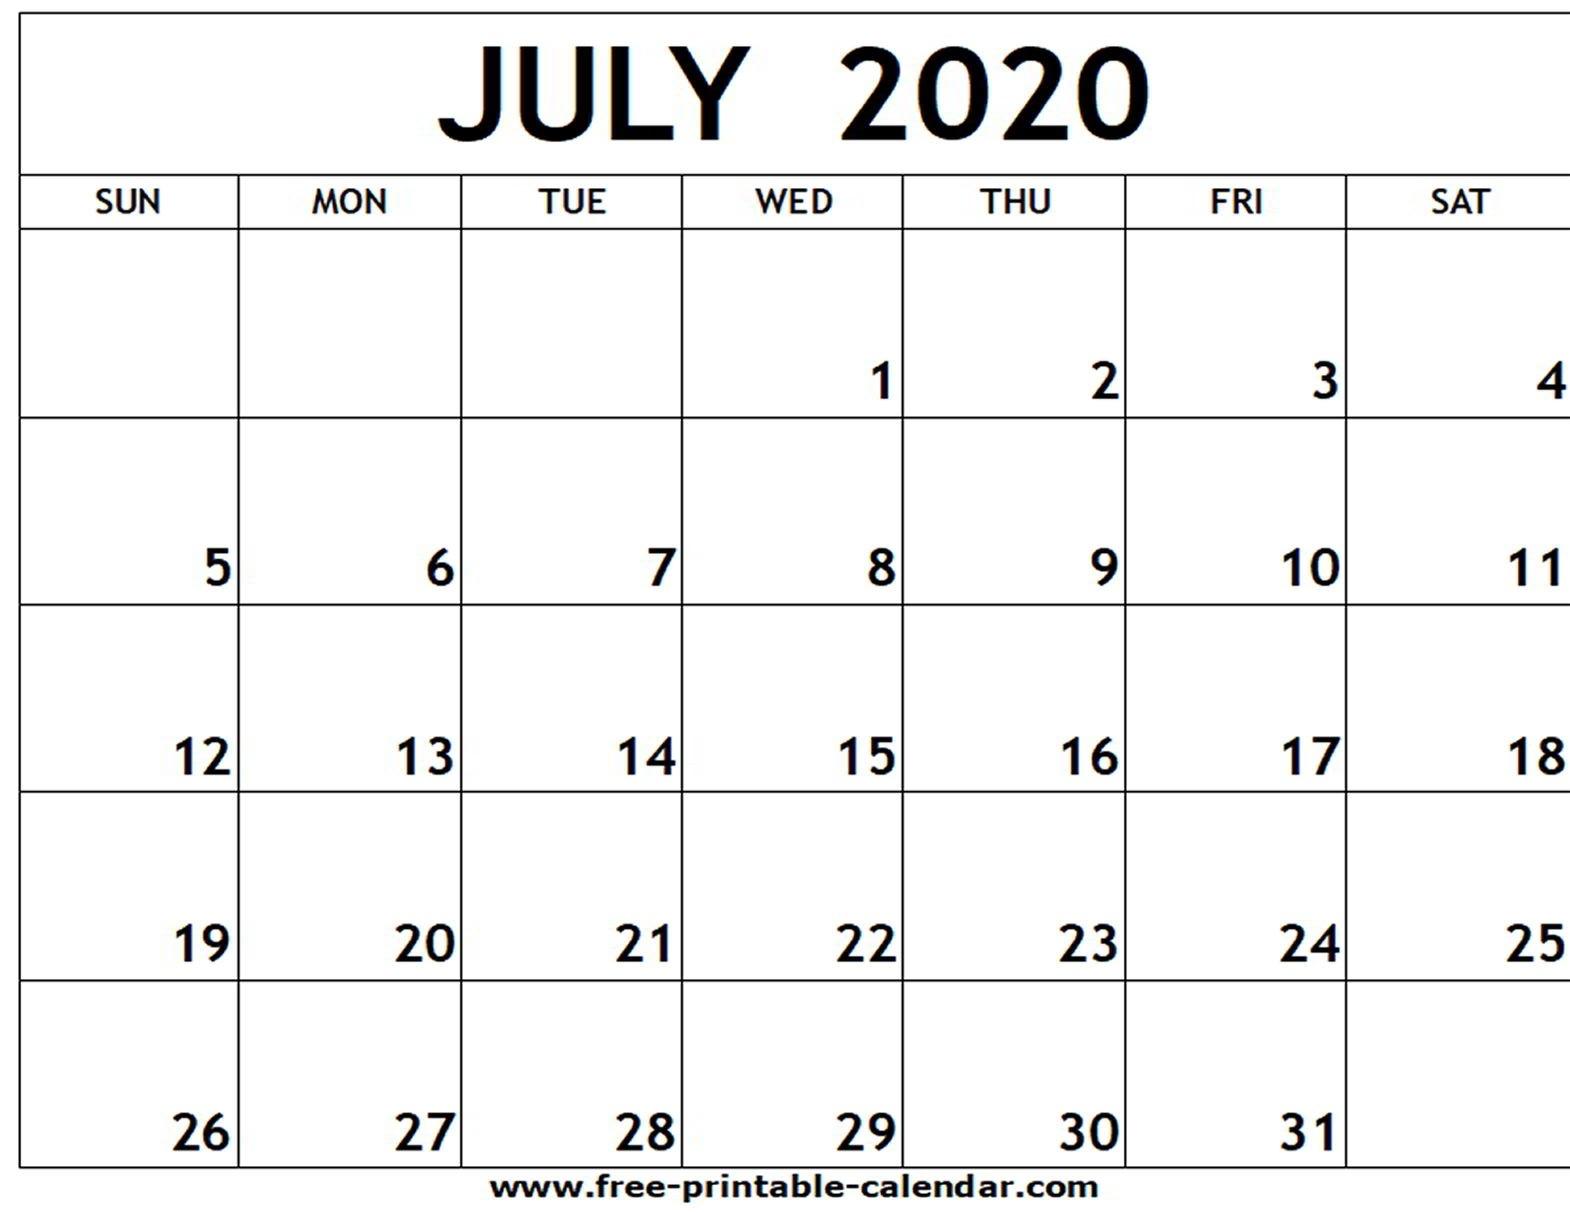 July 2020 Printable Calendar - Free-Printable-Calendar-Blank Calendar June-July 2020